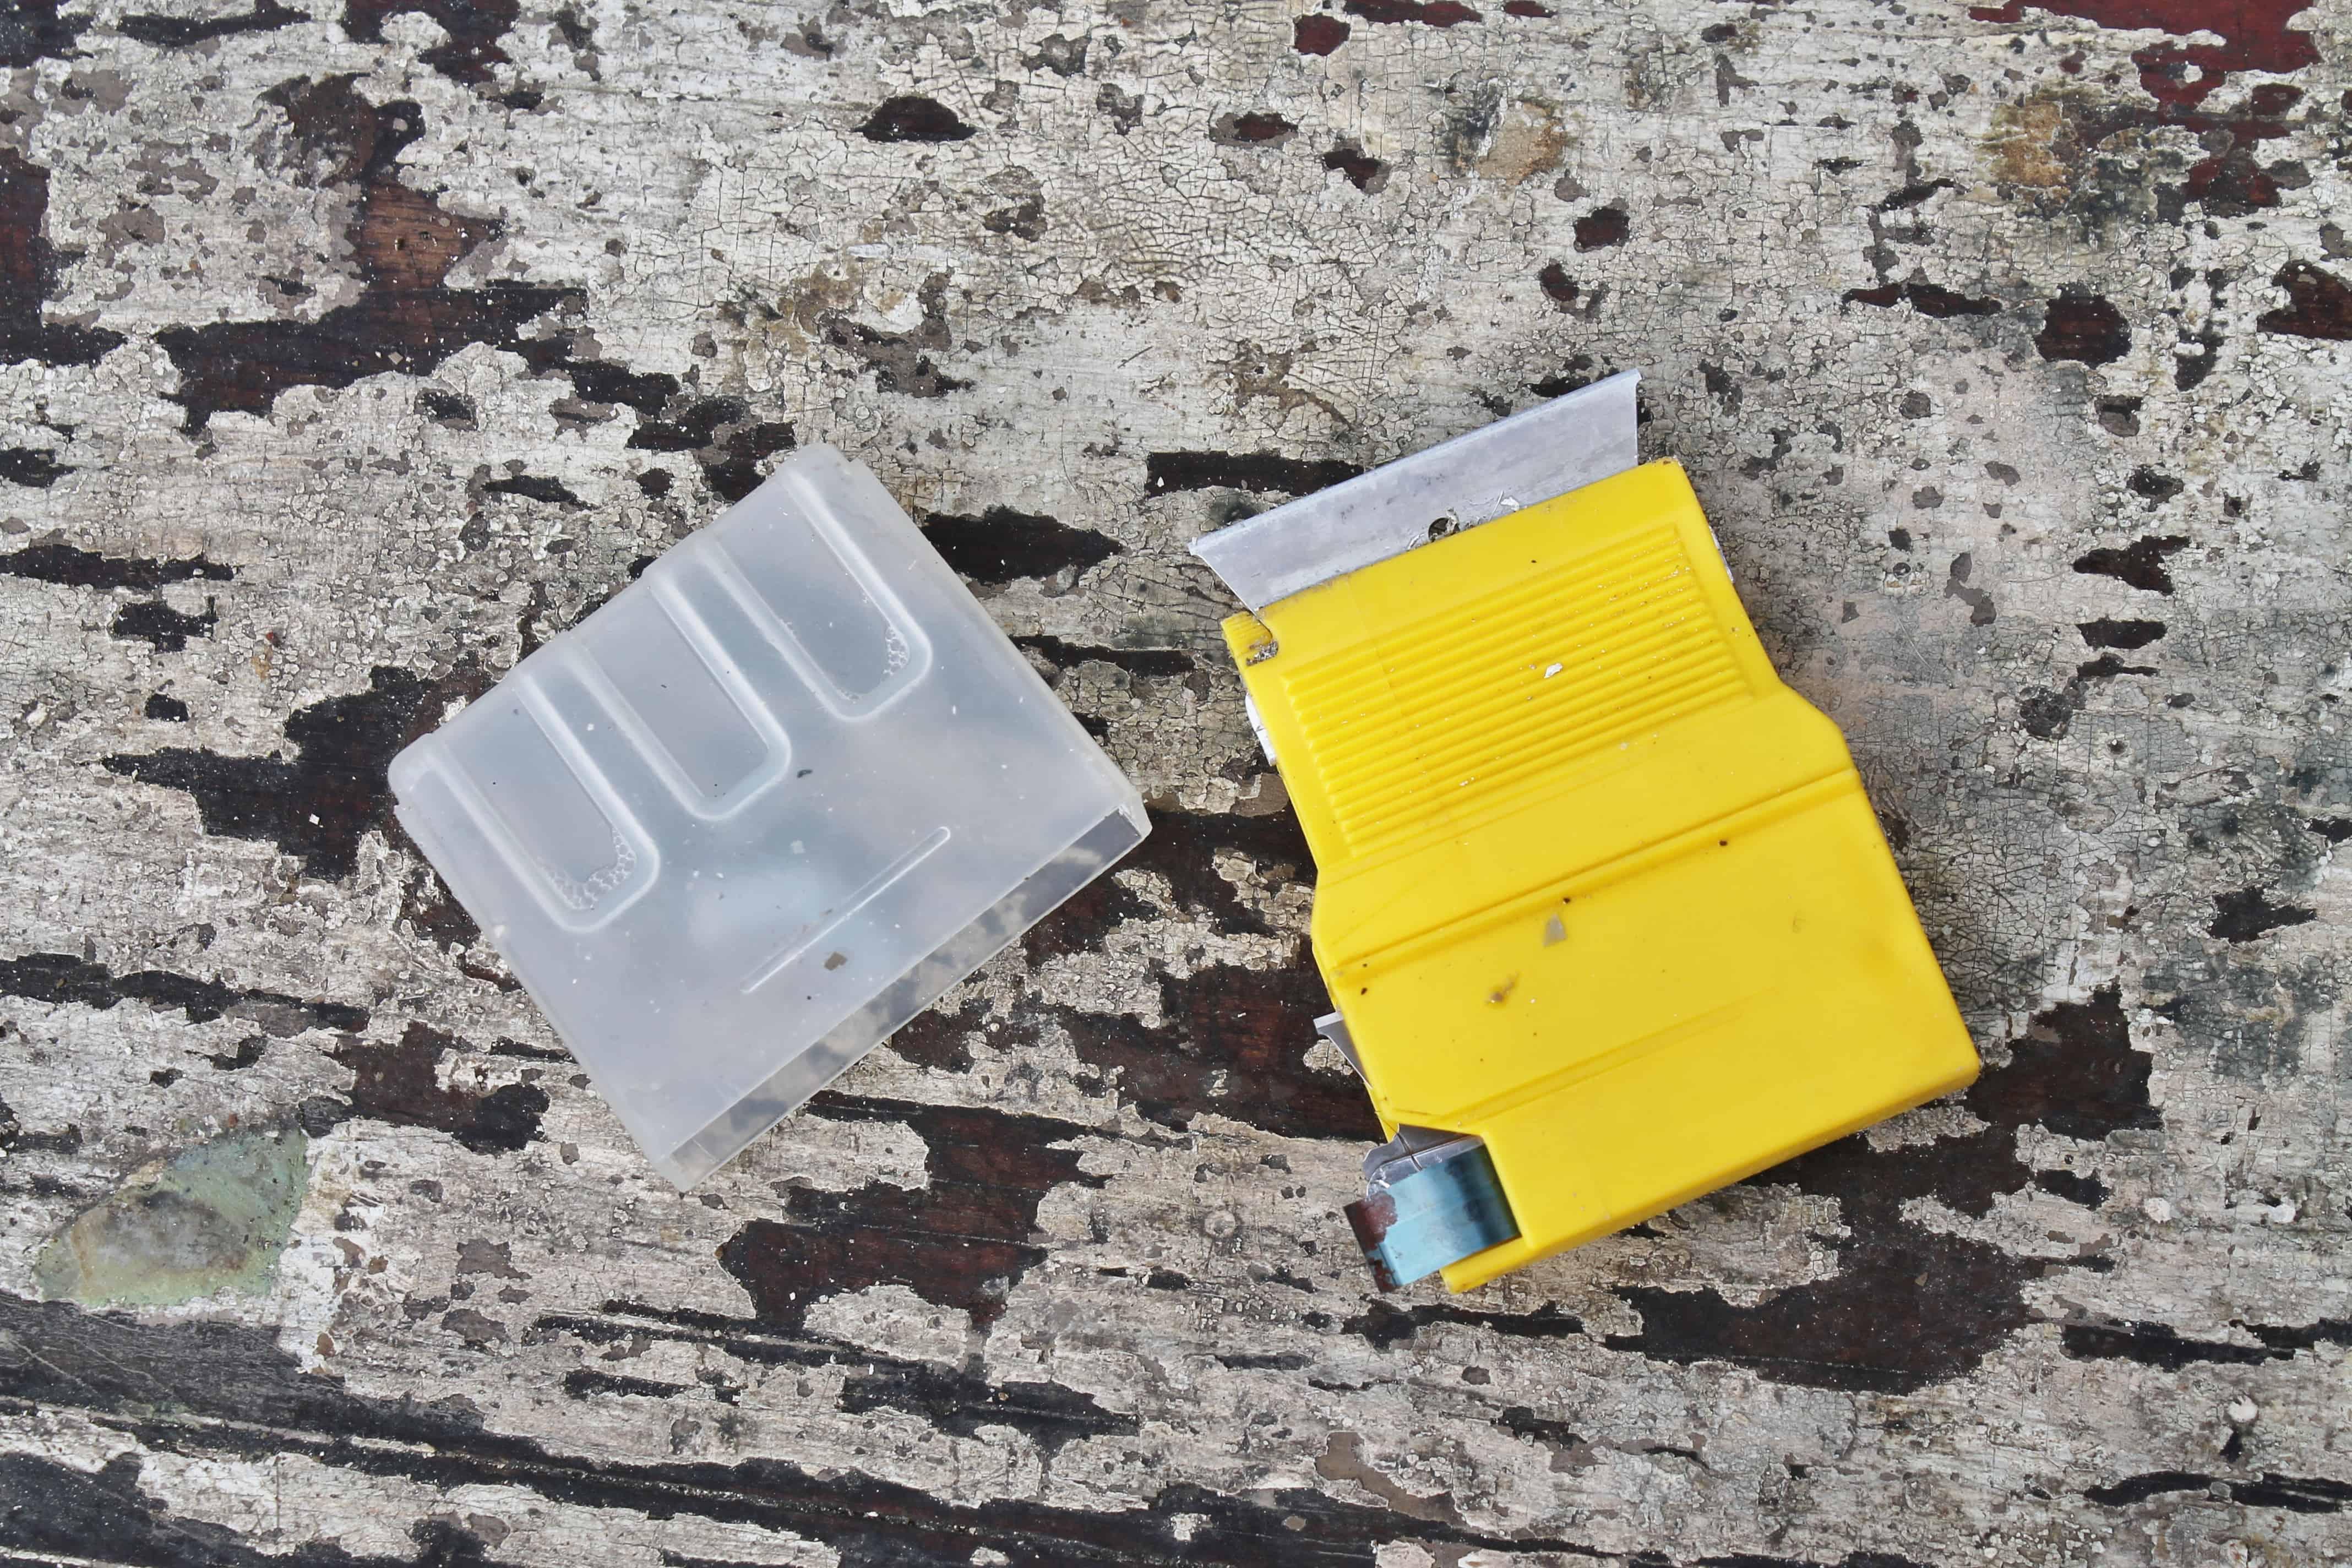 widget-razor-blade-tool-for-scraping-gunk